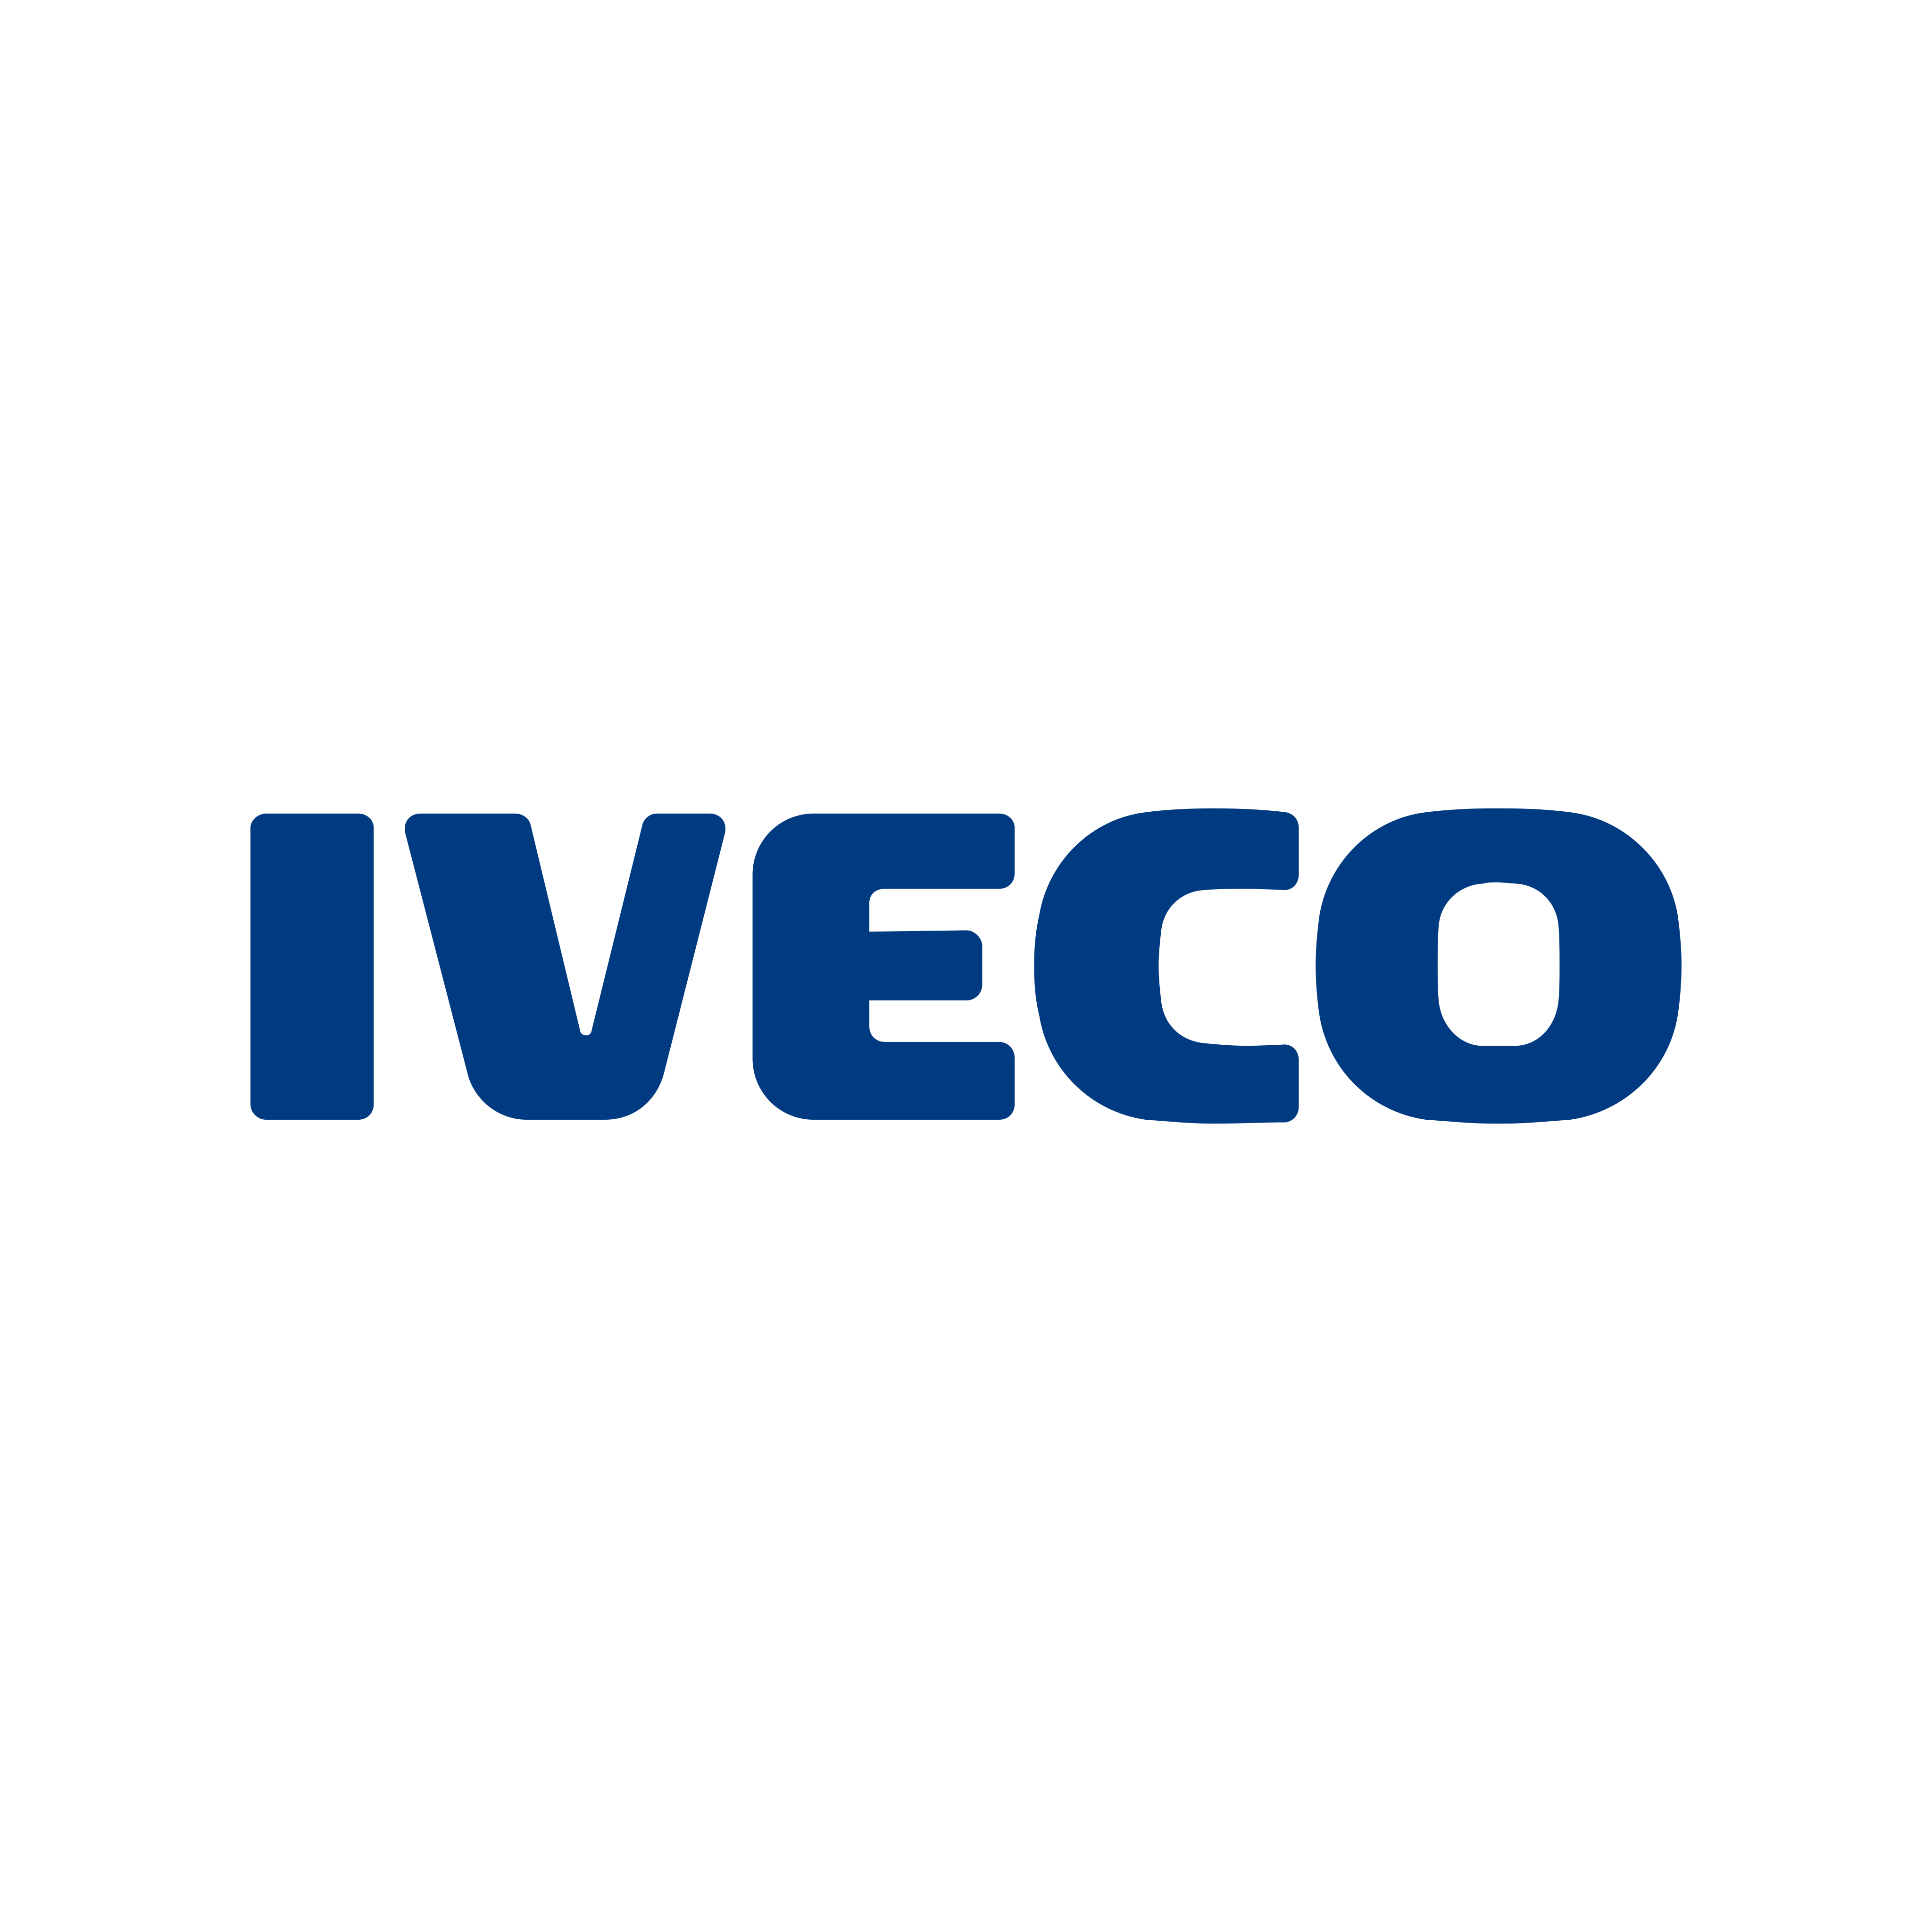 iveco logo 0 - Iveco Logo